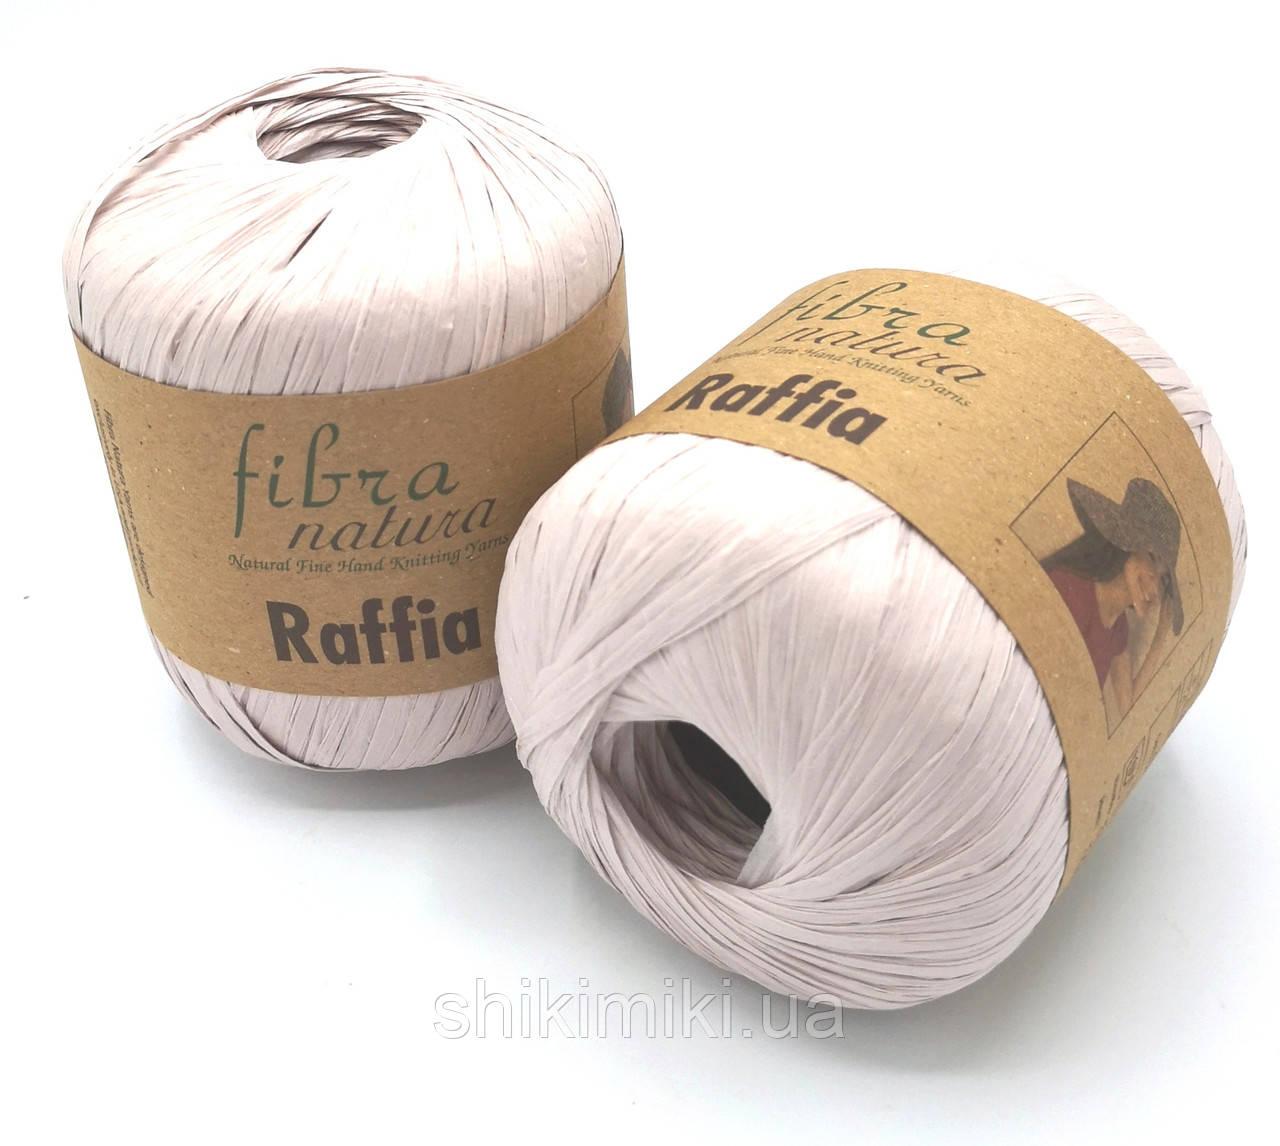 Пряжа Raffia Fibranatura, цвет Пудровый